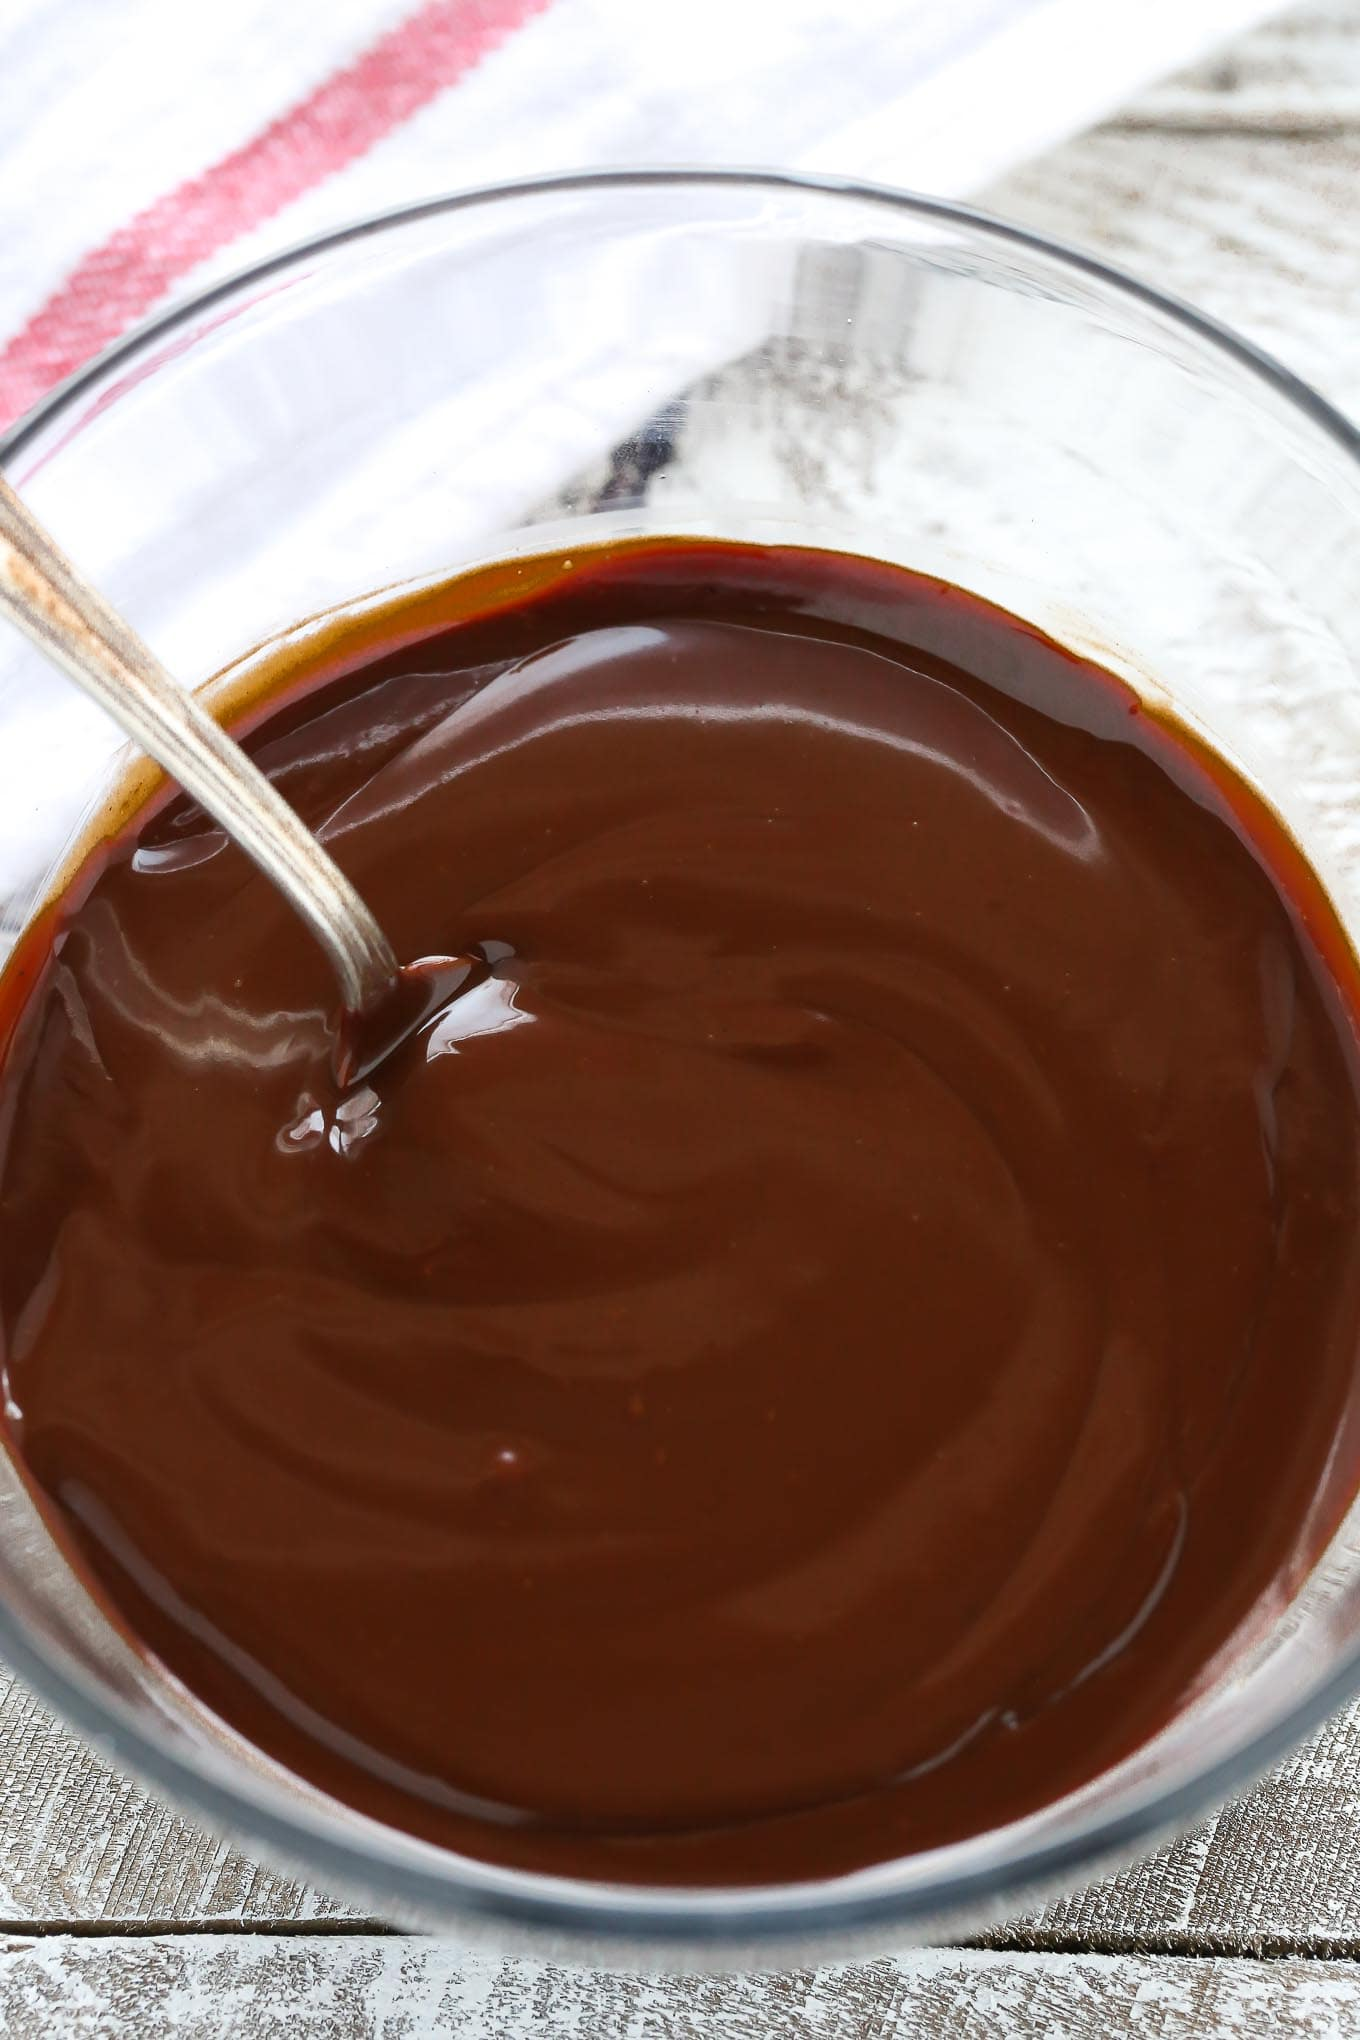 Chocolate Cream 3 The Hard Way